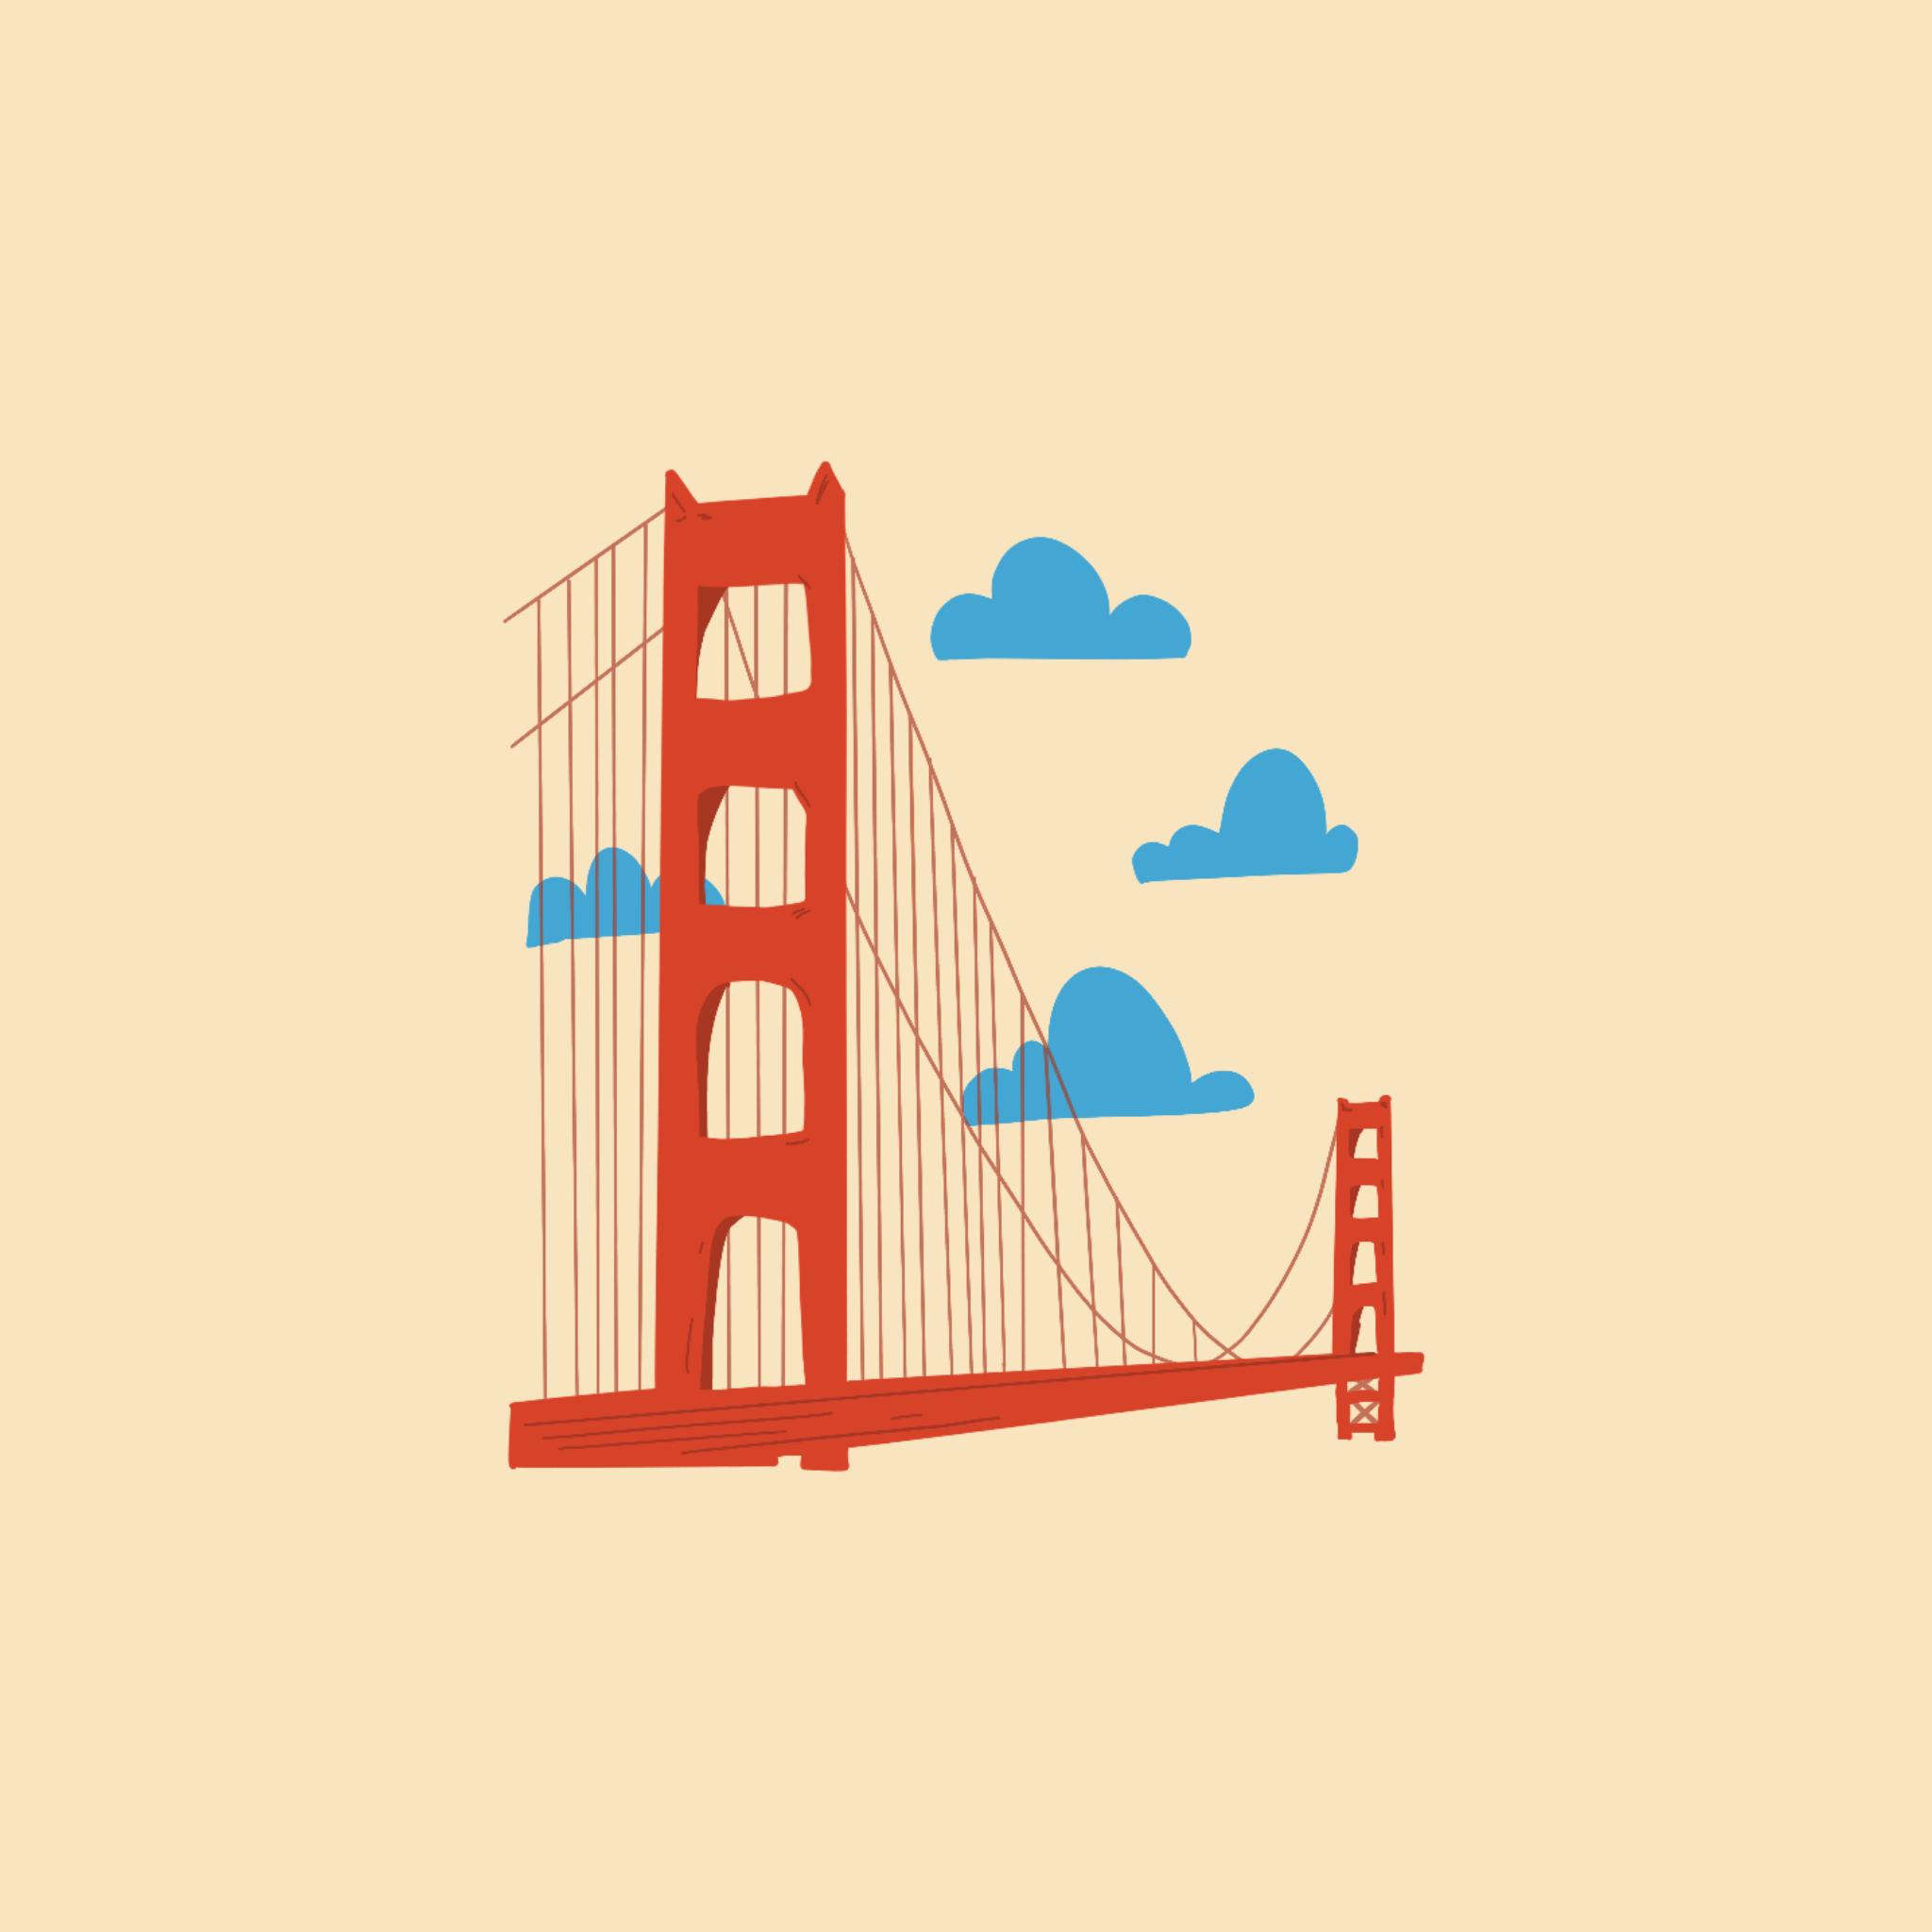 Golden_Gate_Only